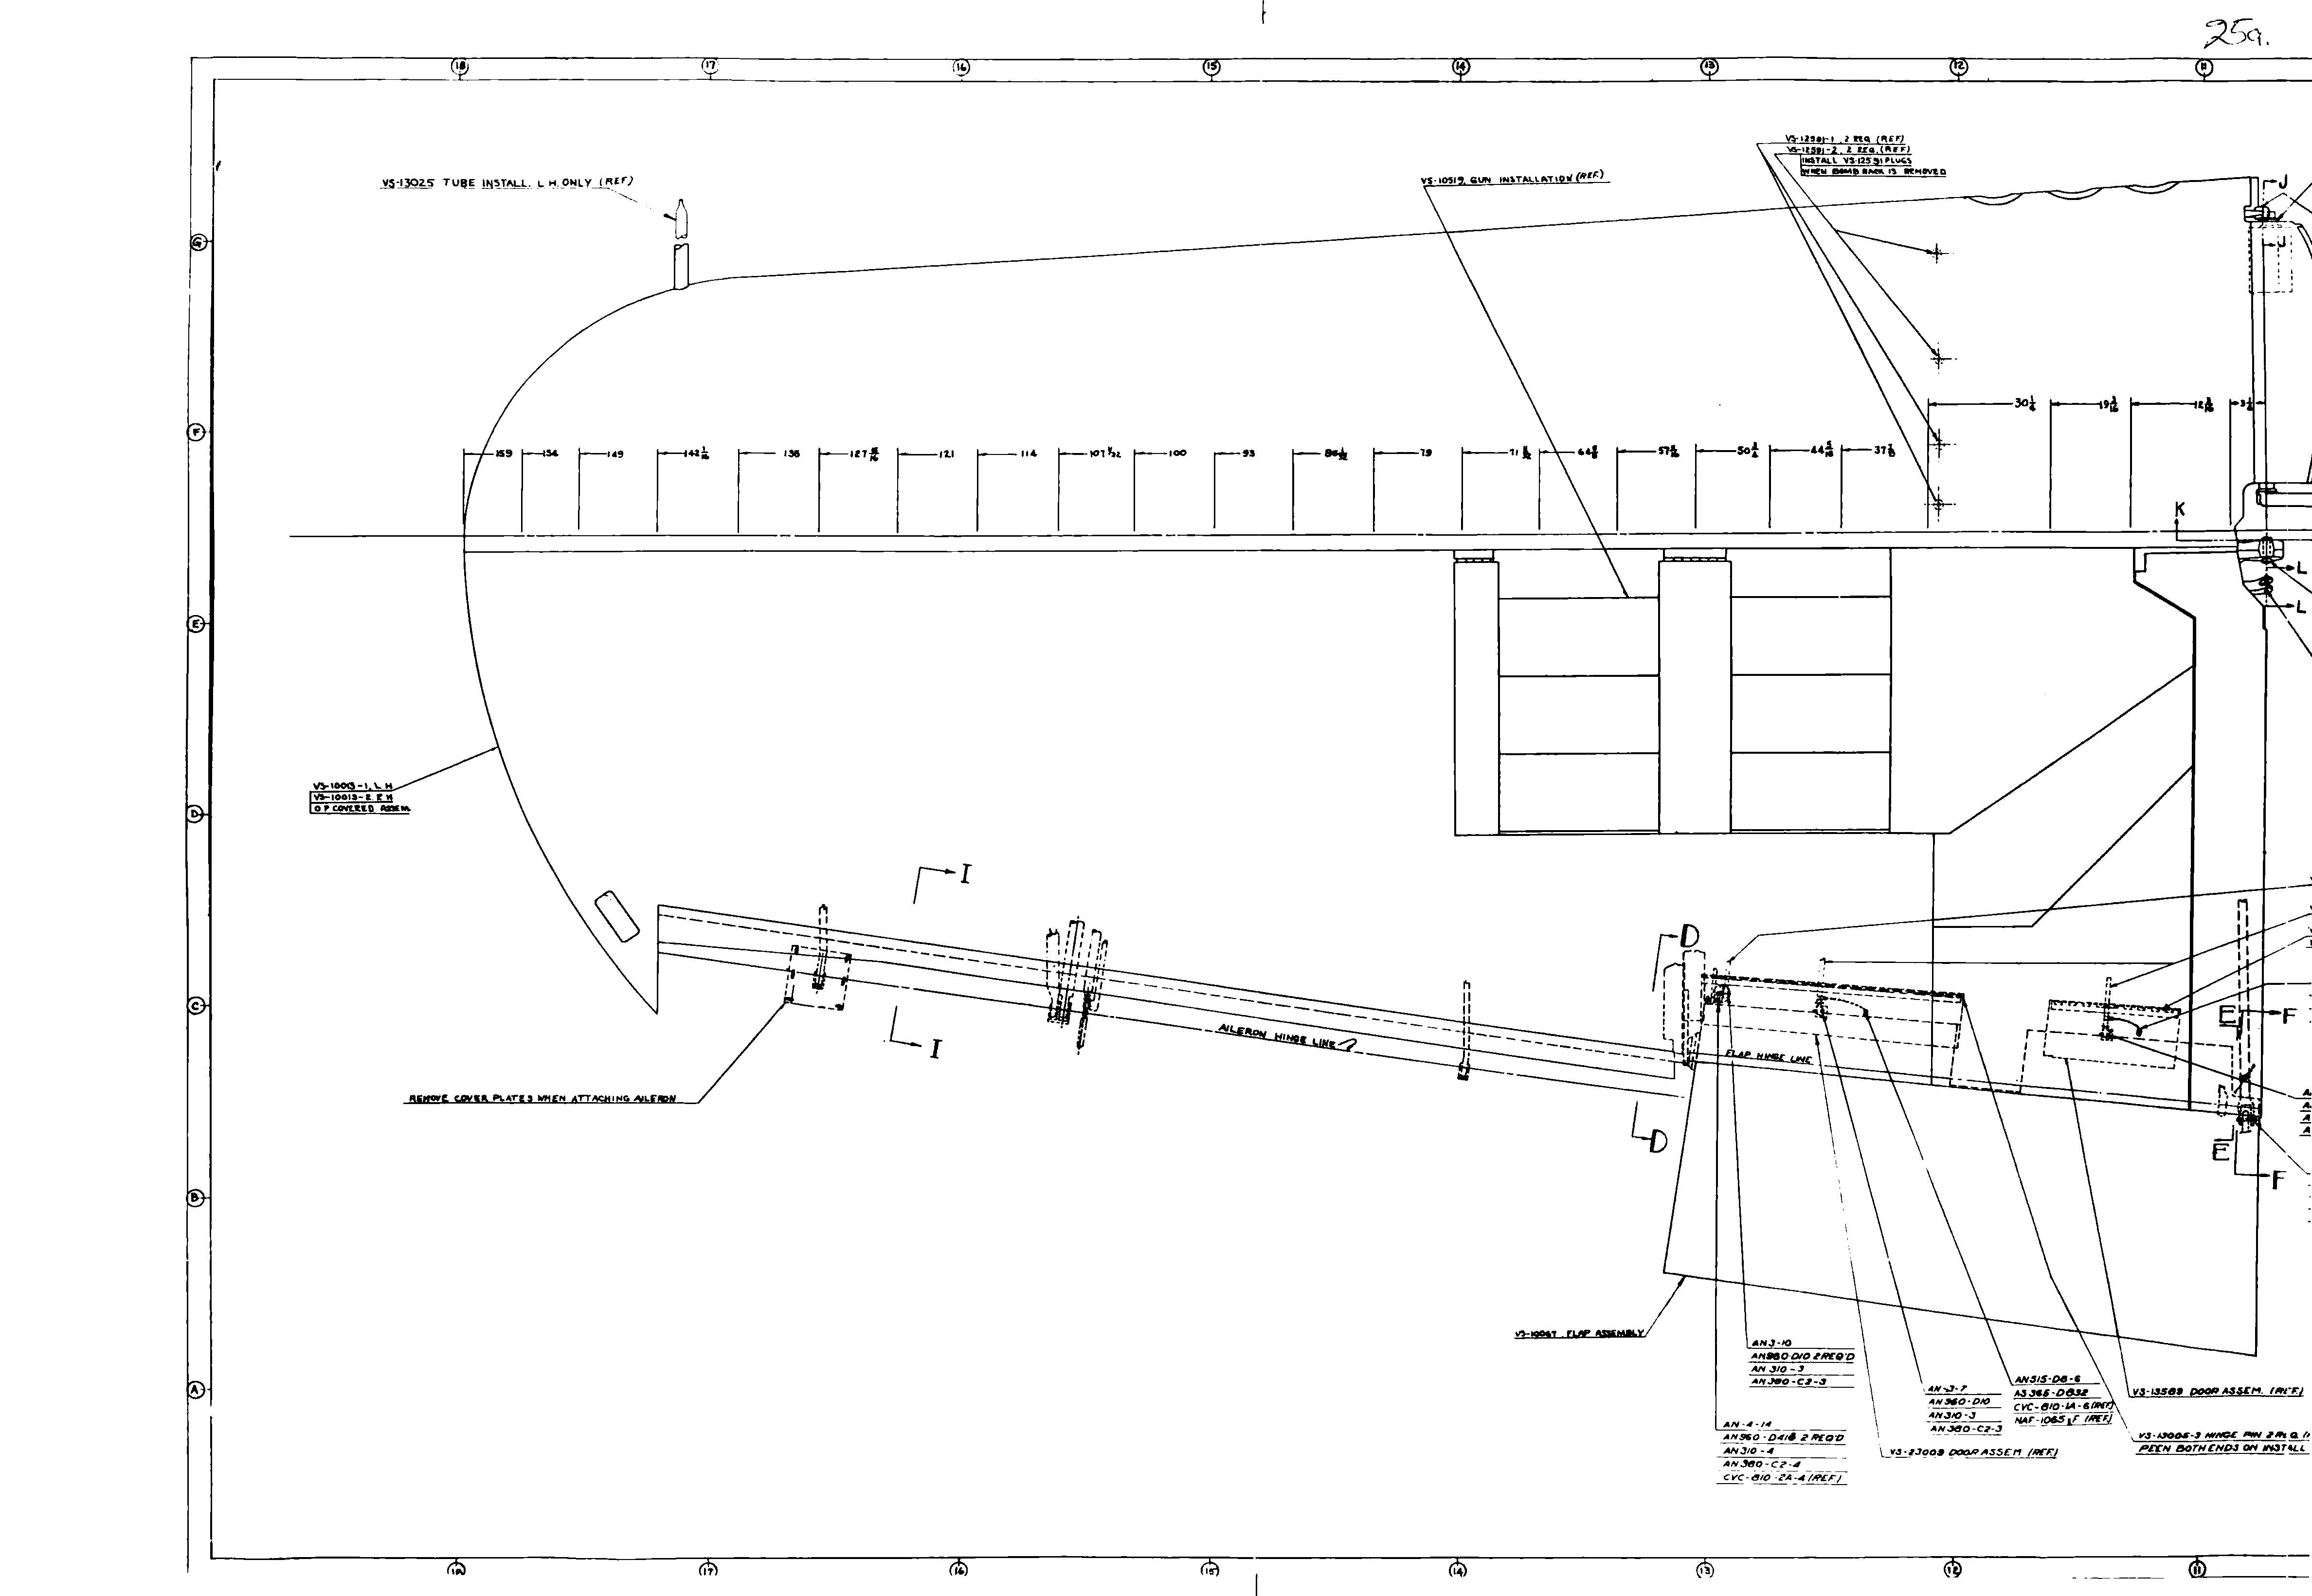 F4U-1_AssmbyDrawingsBlueprints295_Page_008.jpg